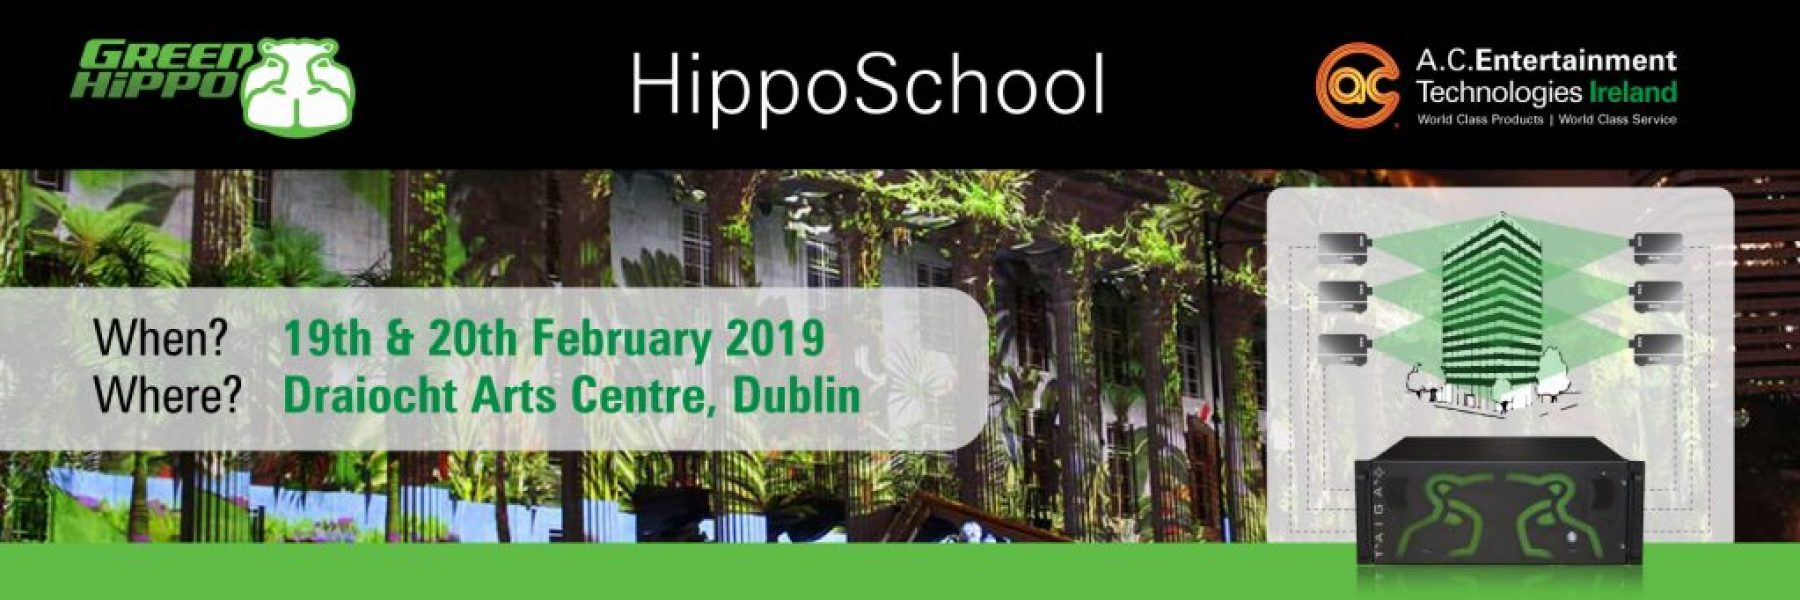 Green Hippo Hipposchool